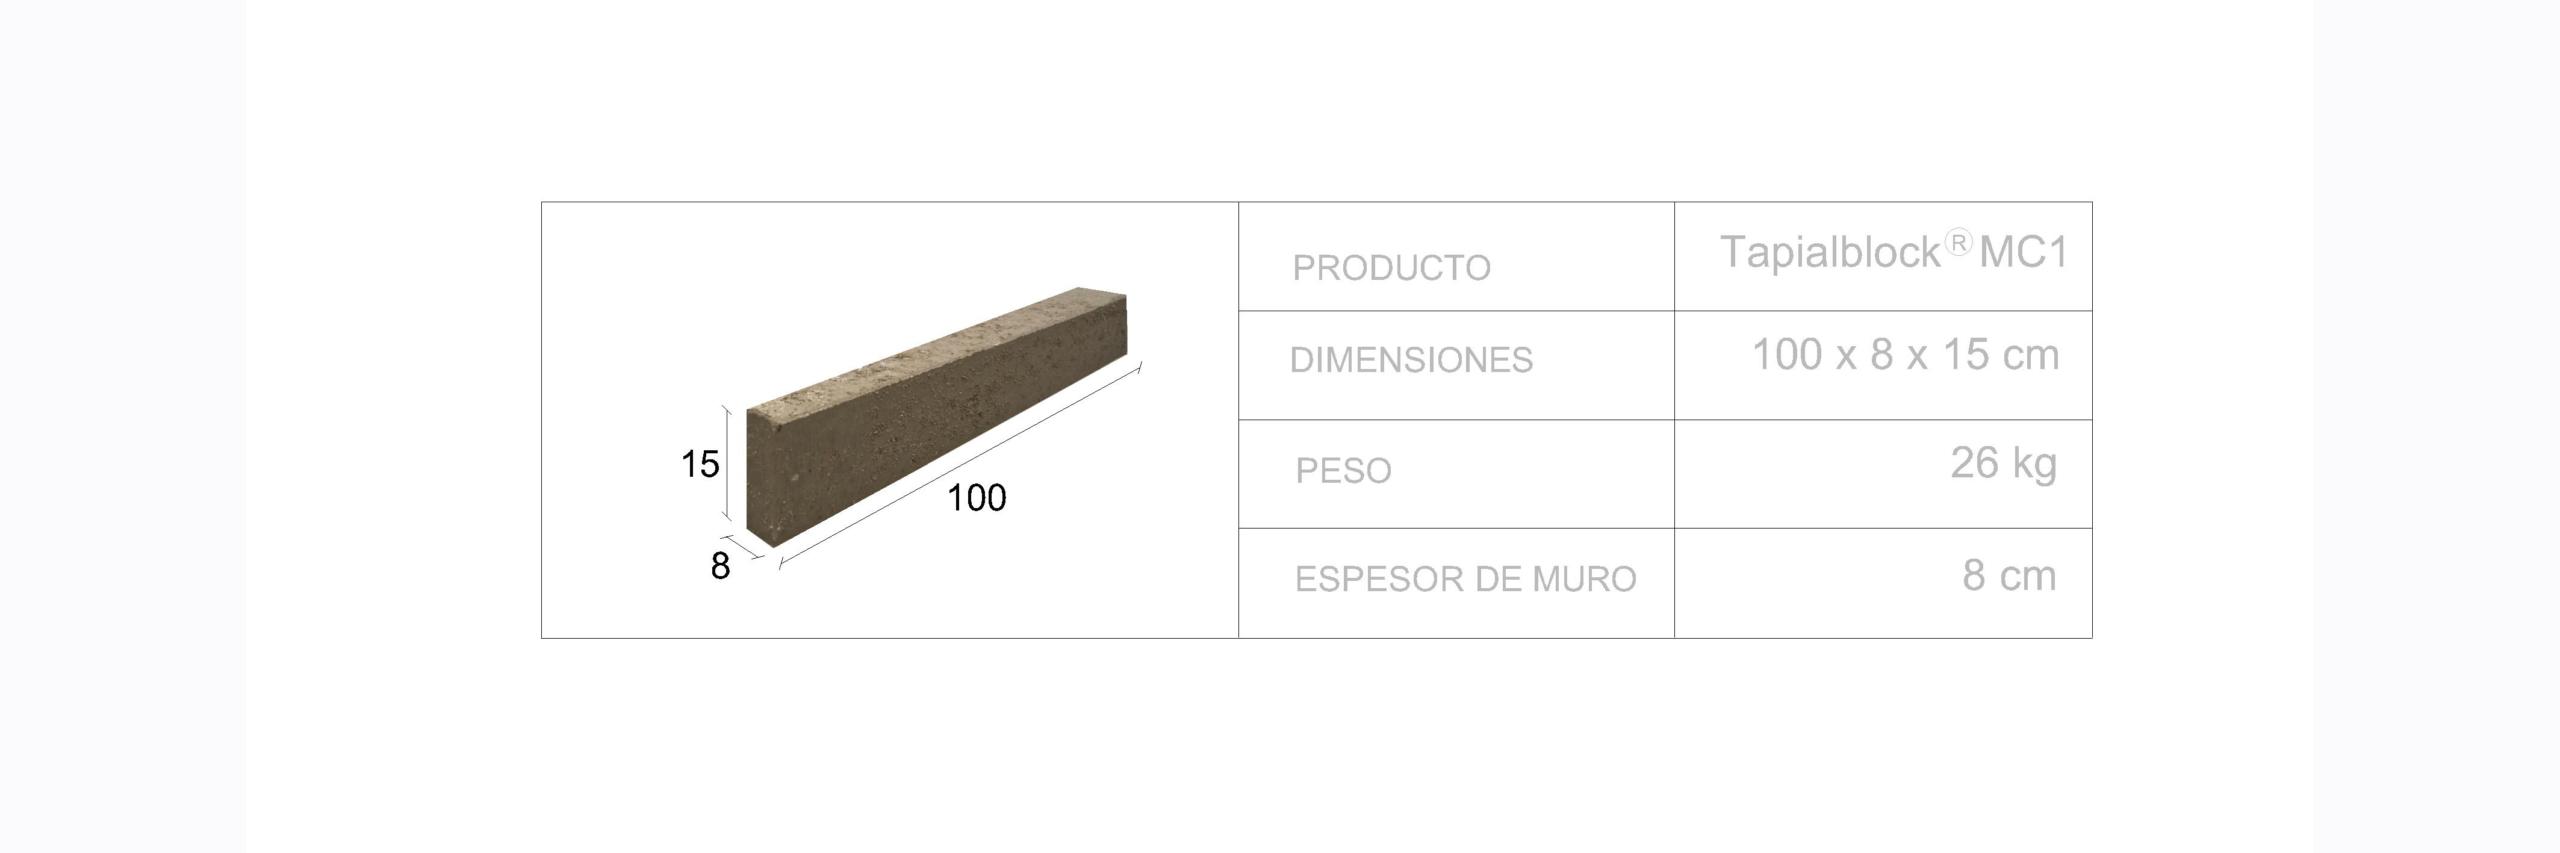 Tapialblock® MC1 - Fetdeterra